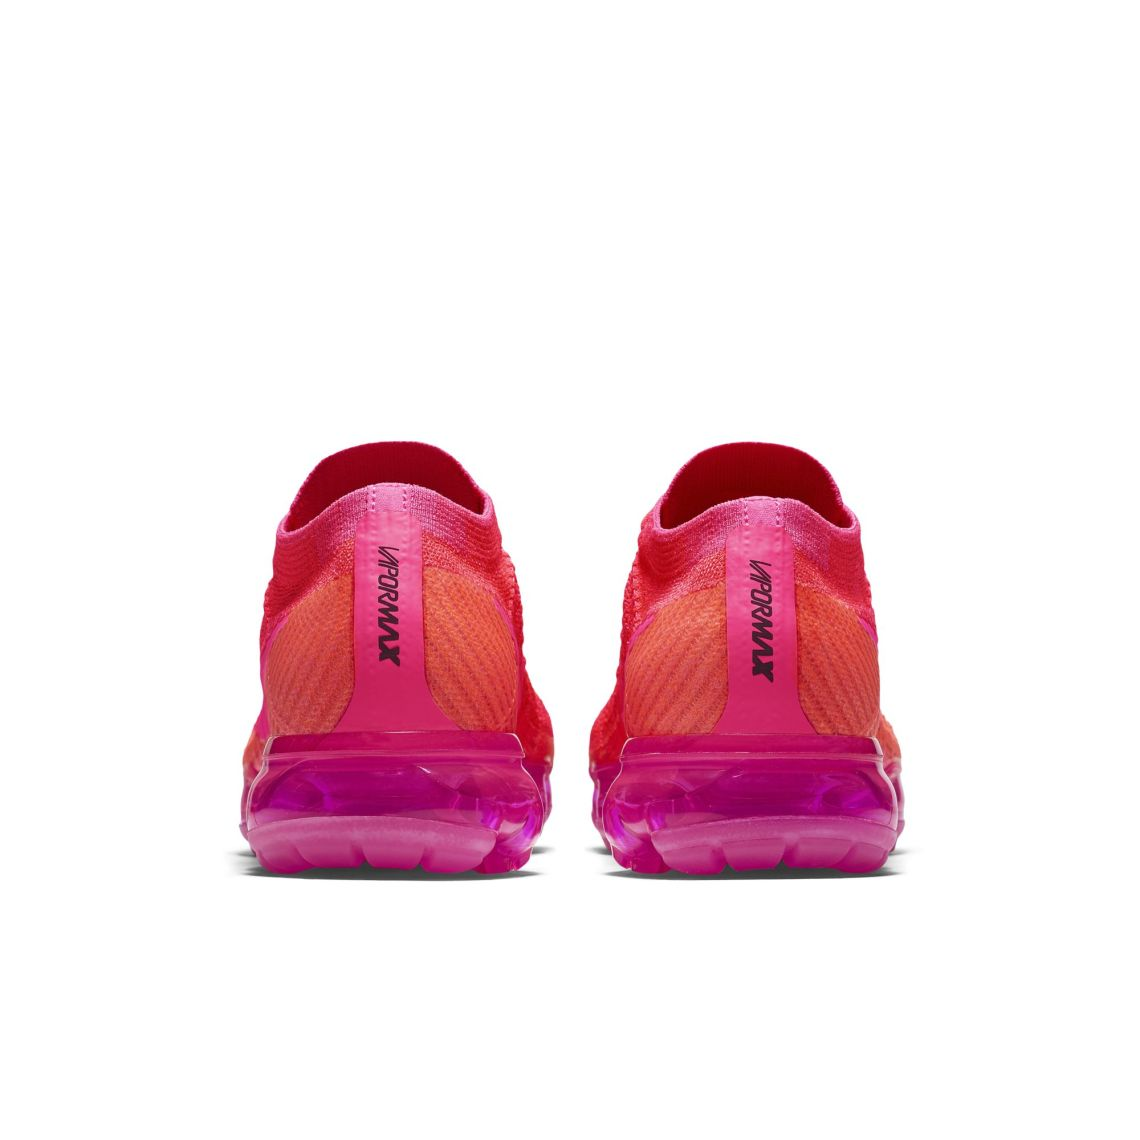 Nike Vapormax Crimson Red